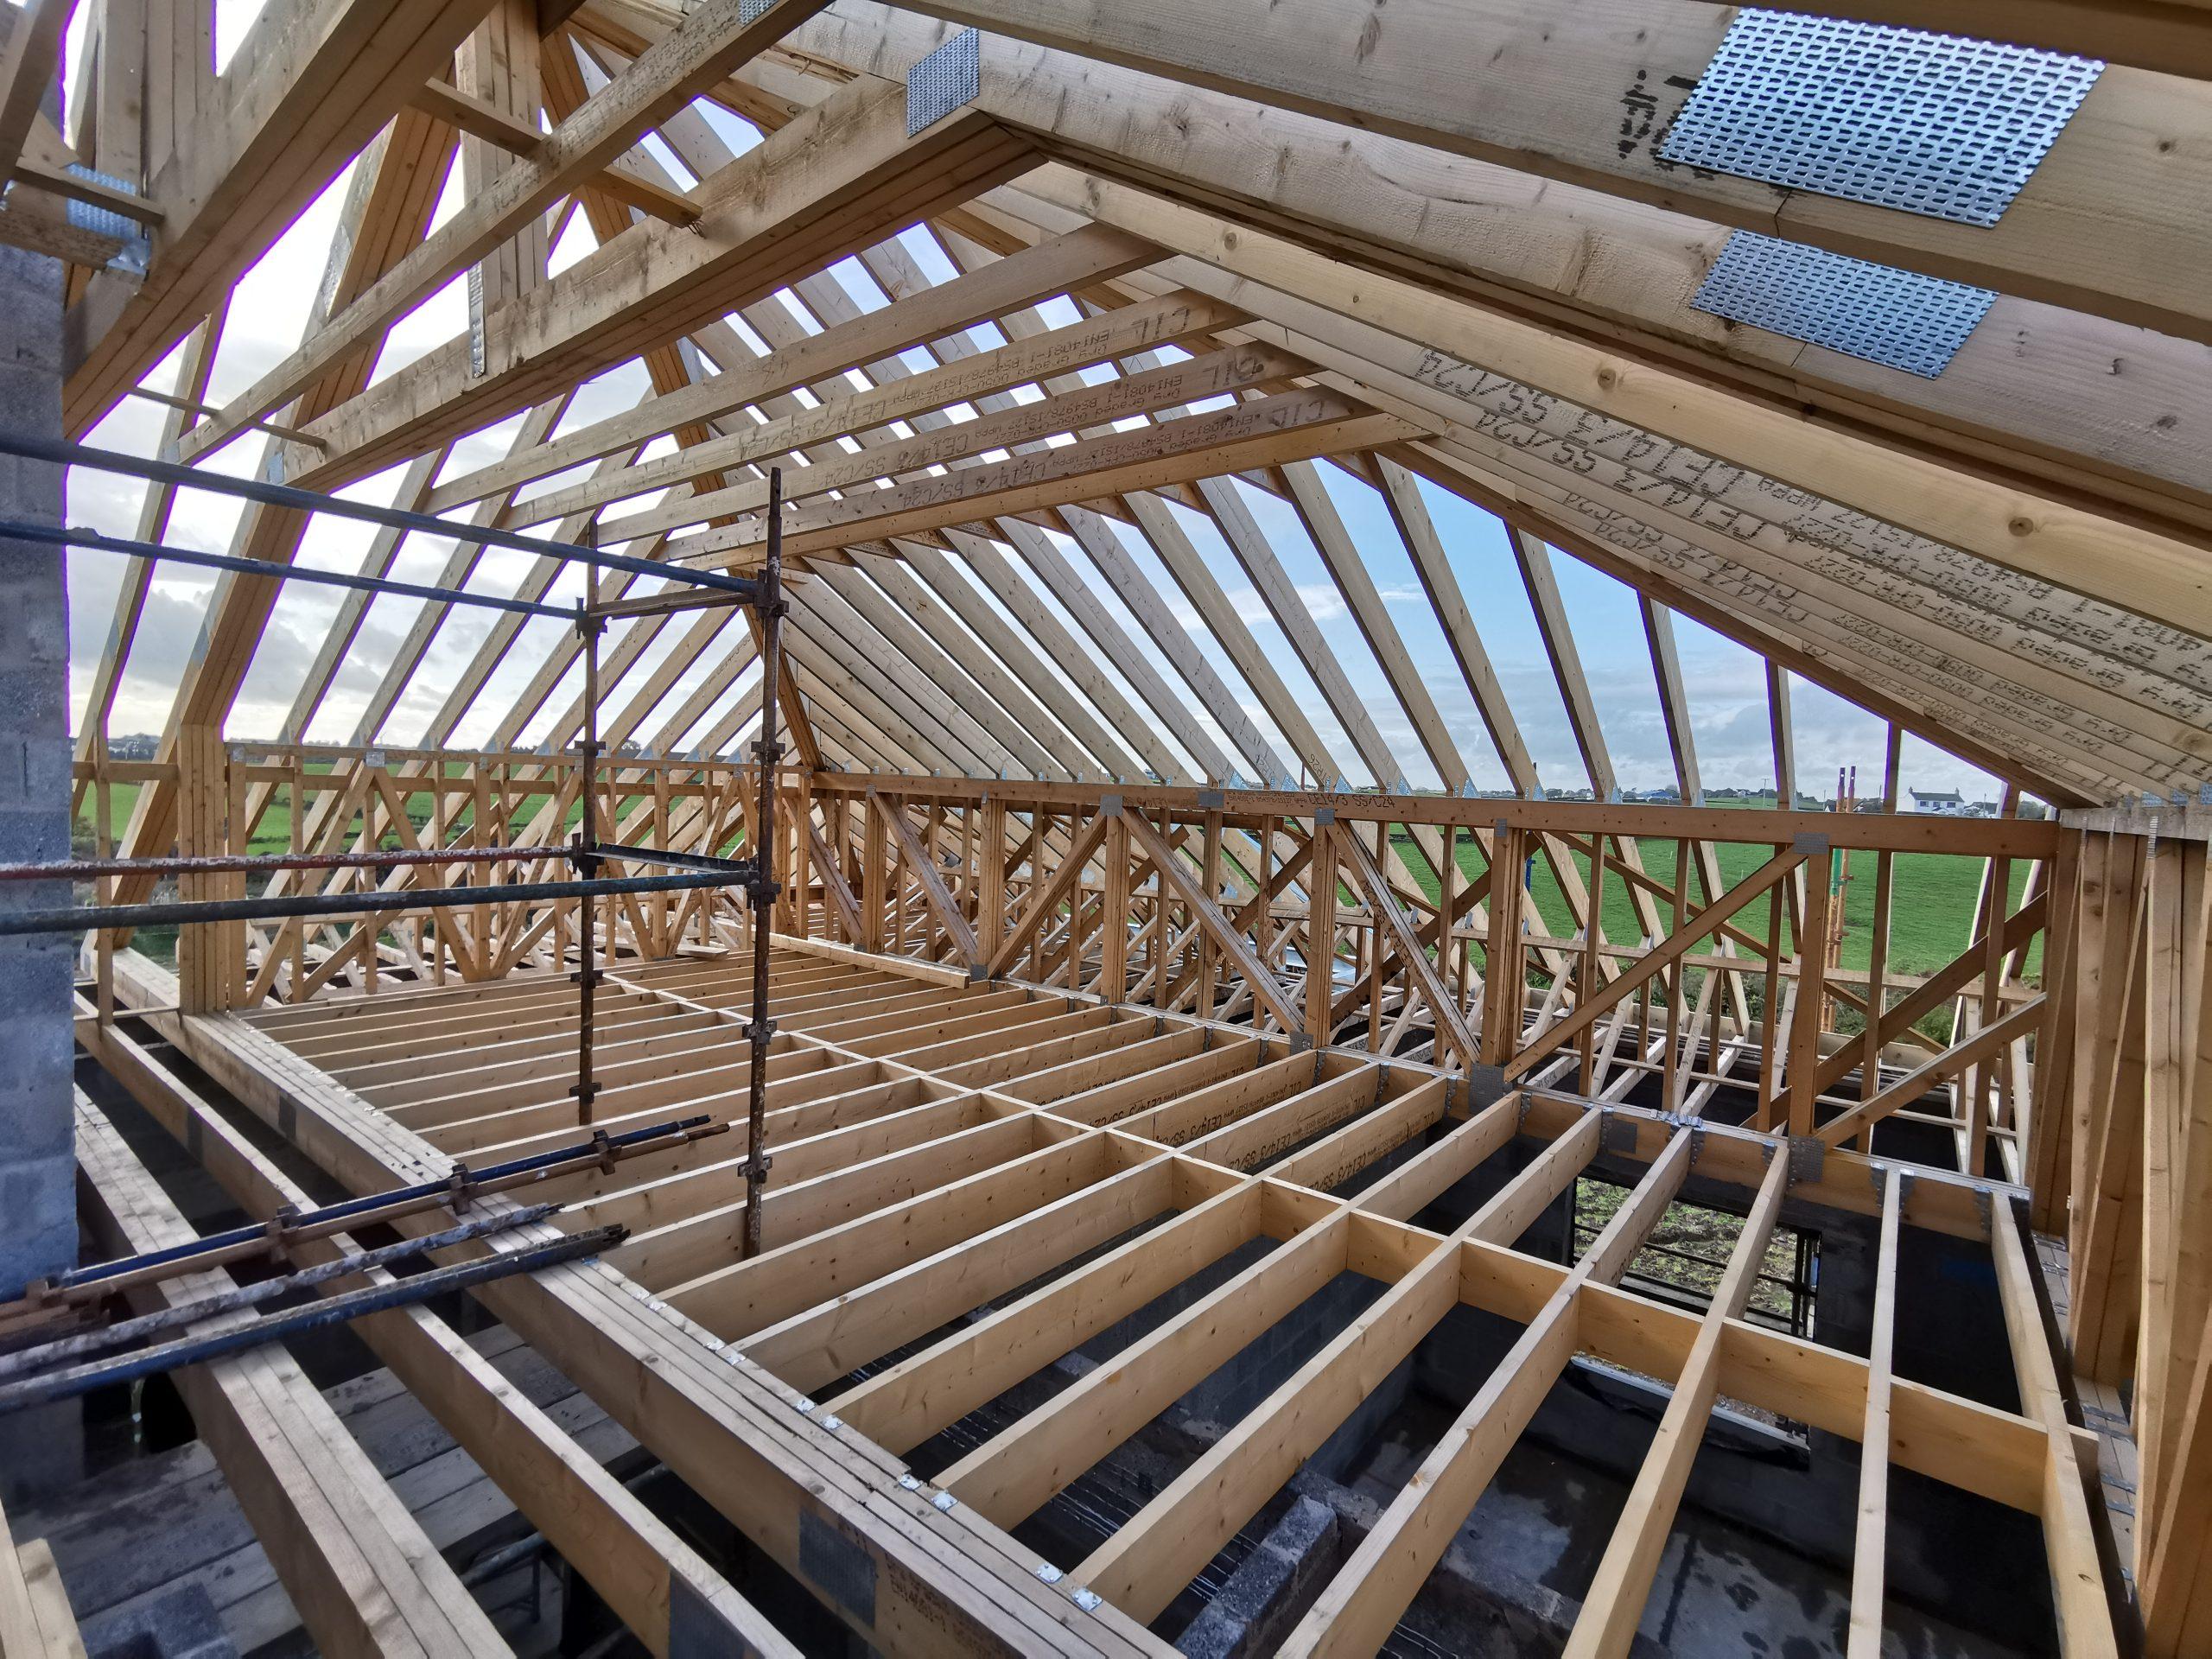 Attic Roof Trusses Murdock Roof Trusses Northern Ireland Dublin